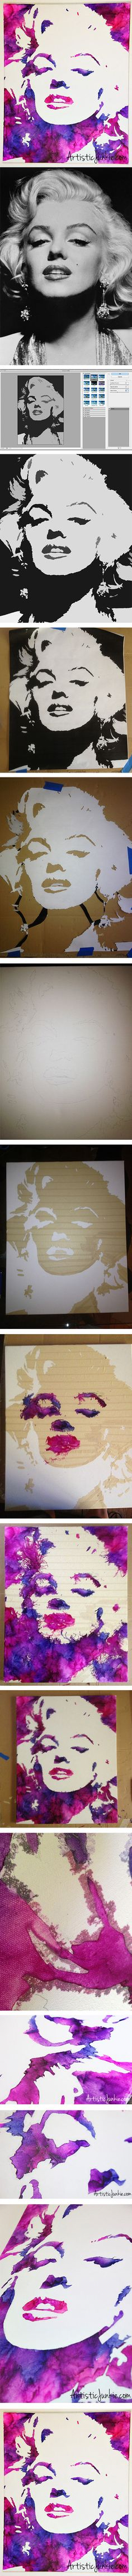 Marilyn Monroe Melted Crayon Art Tutorial